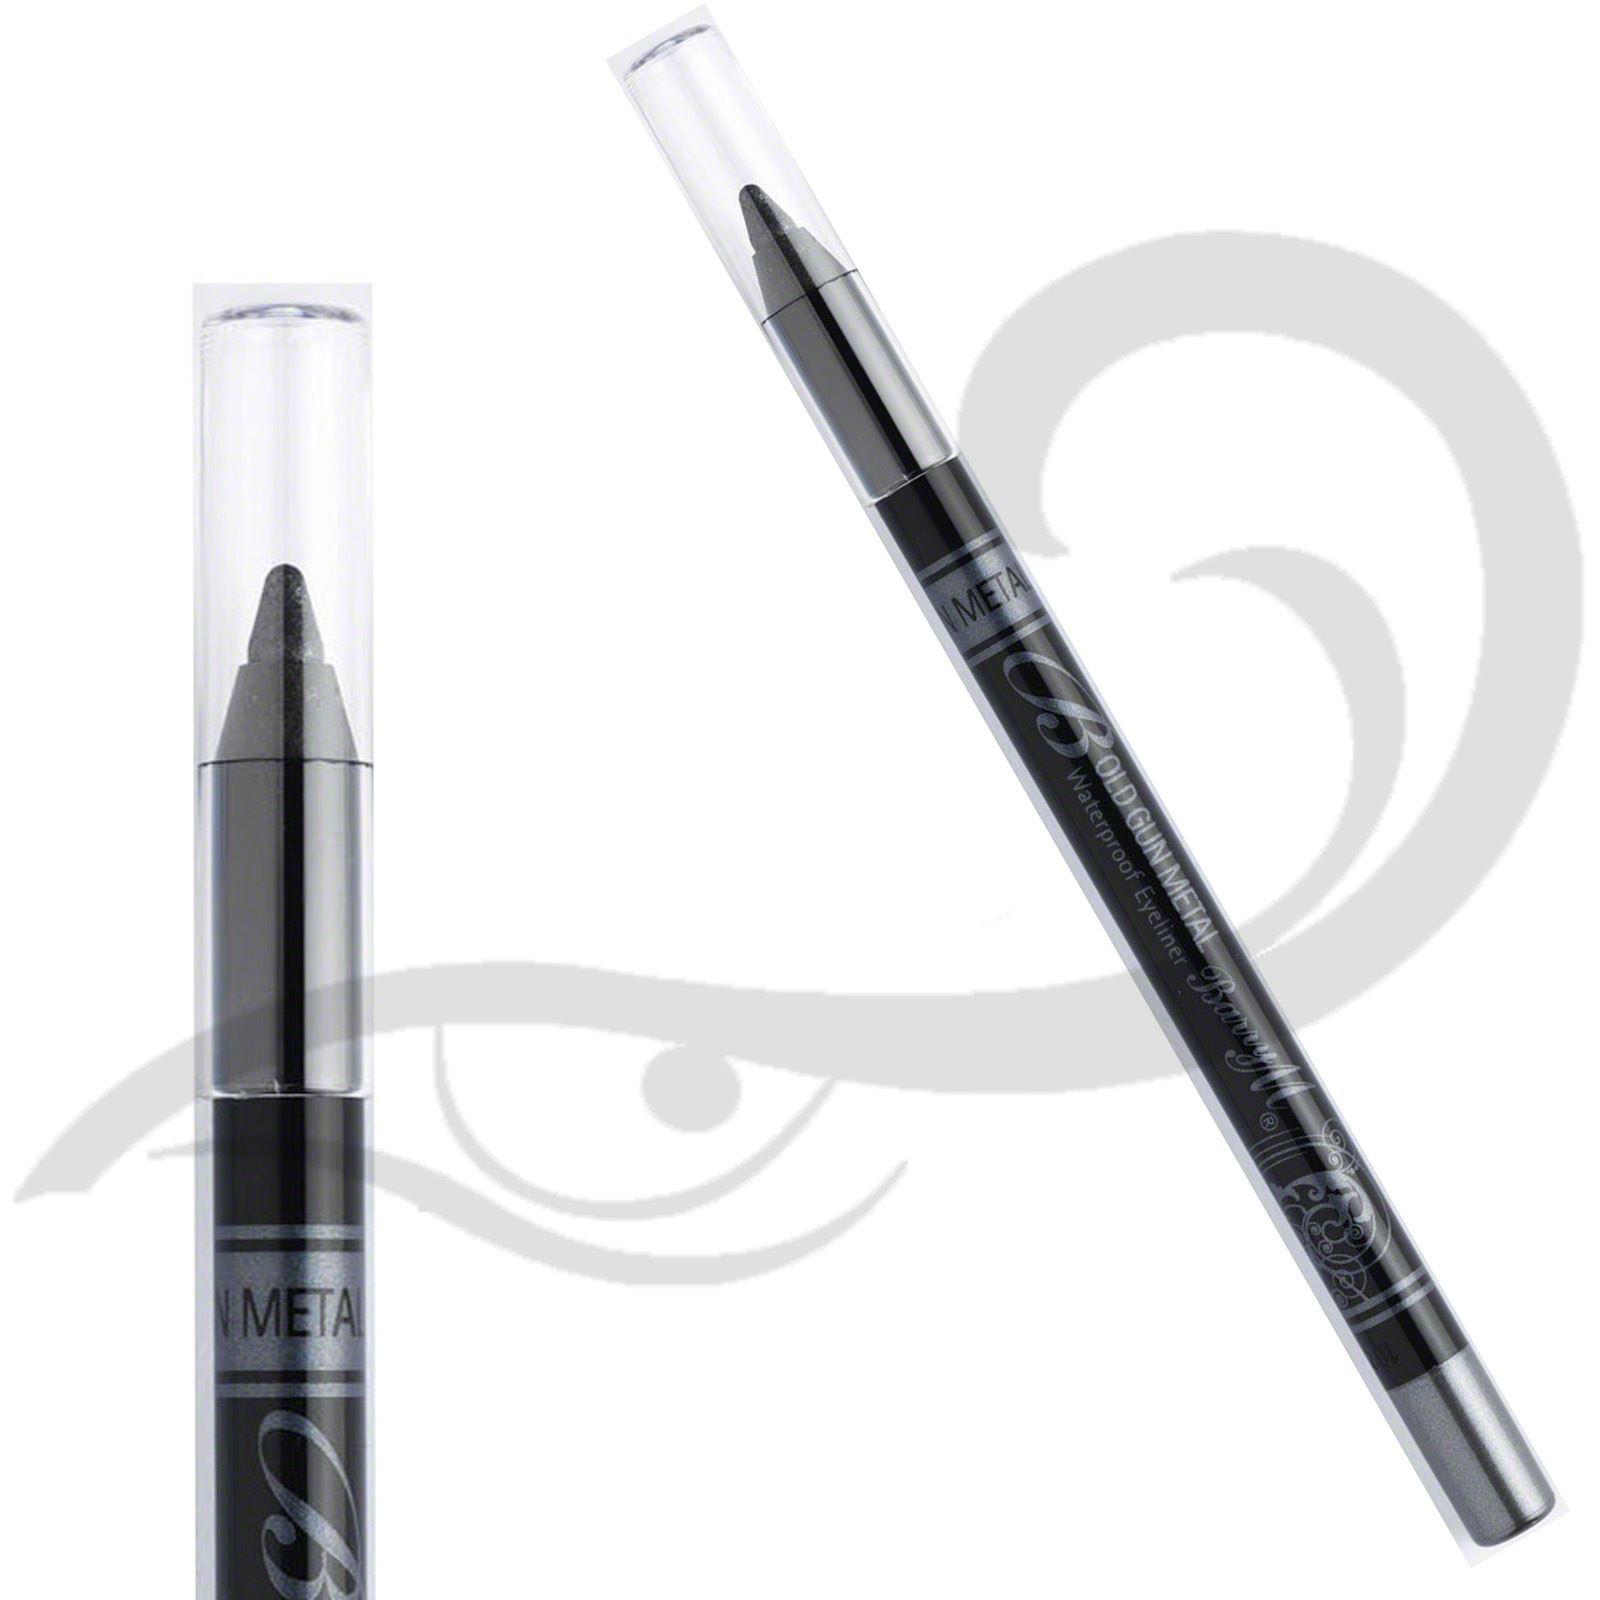 Barry M Eyeliner Kohl Waterproof Pencil Bold Liner Soft Tip All Colours